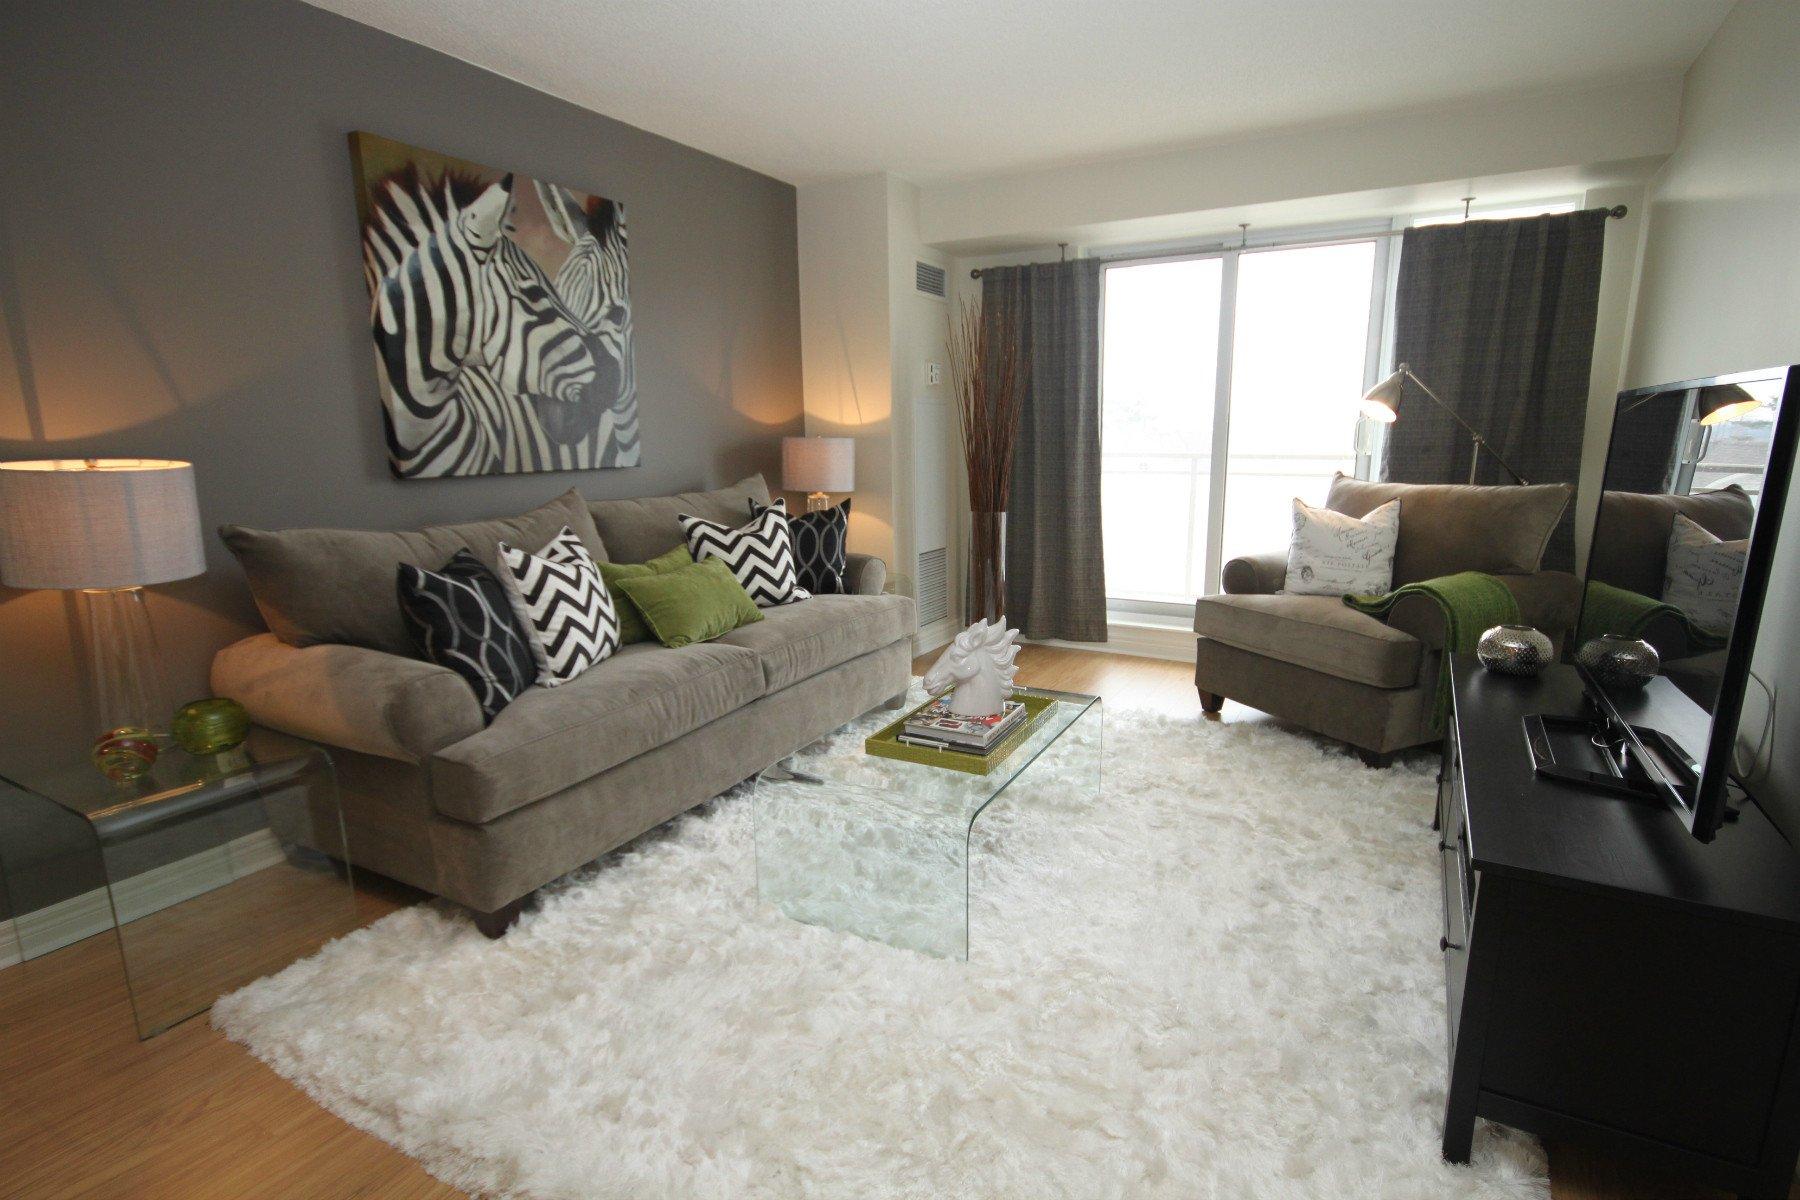 Modern Condo Living Room Decorating Ideas Fresh 34 Living Room Decorating Ideas for Apartments Living Room Modern Apartment Living Room